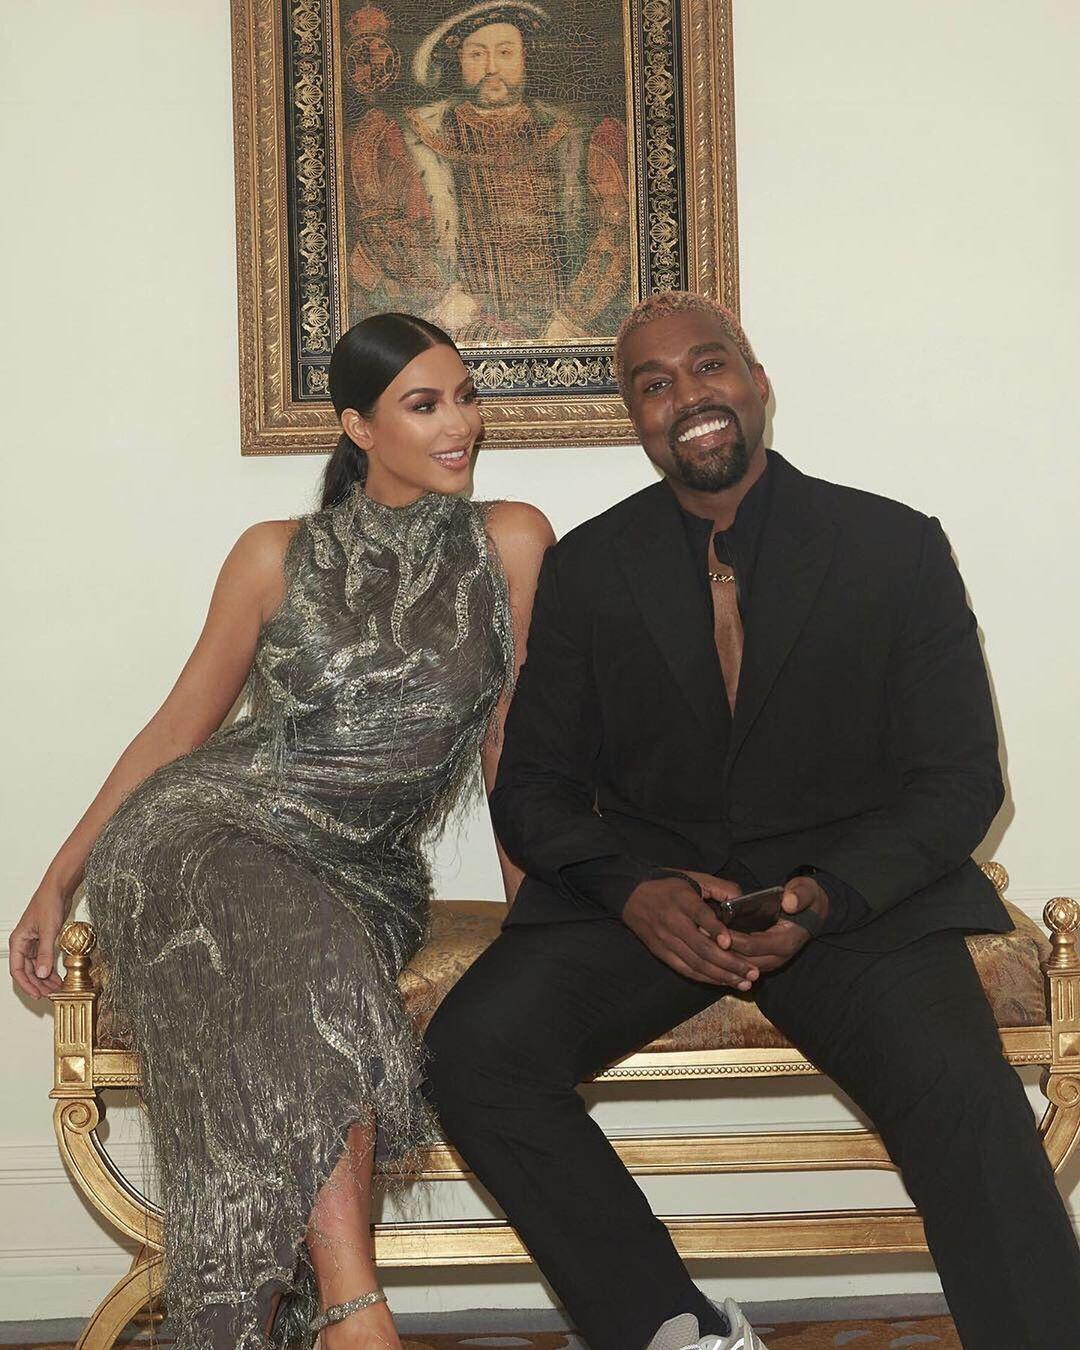 Kim Kardashian West Kimkardashian Instagram Photos And Videos Kim Kardashian And Kanye Kim And Kanye Kim Kardashian Outfits